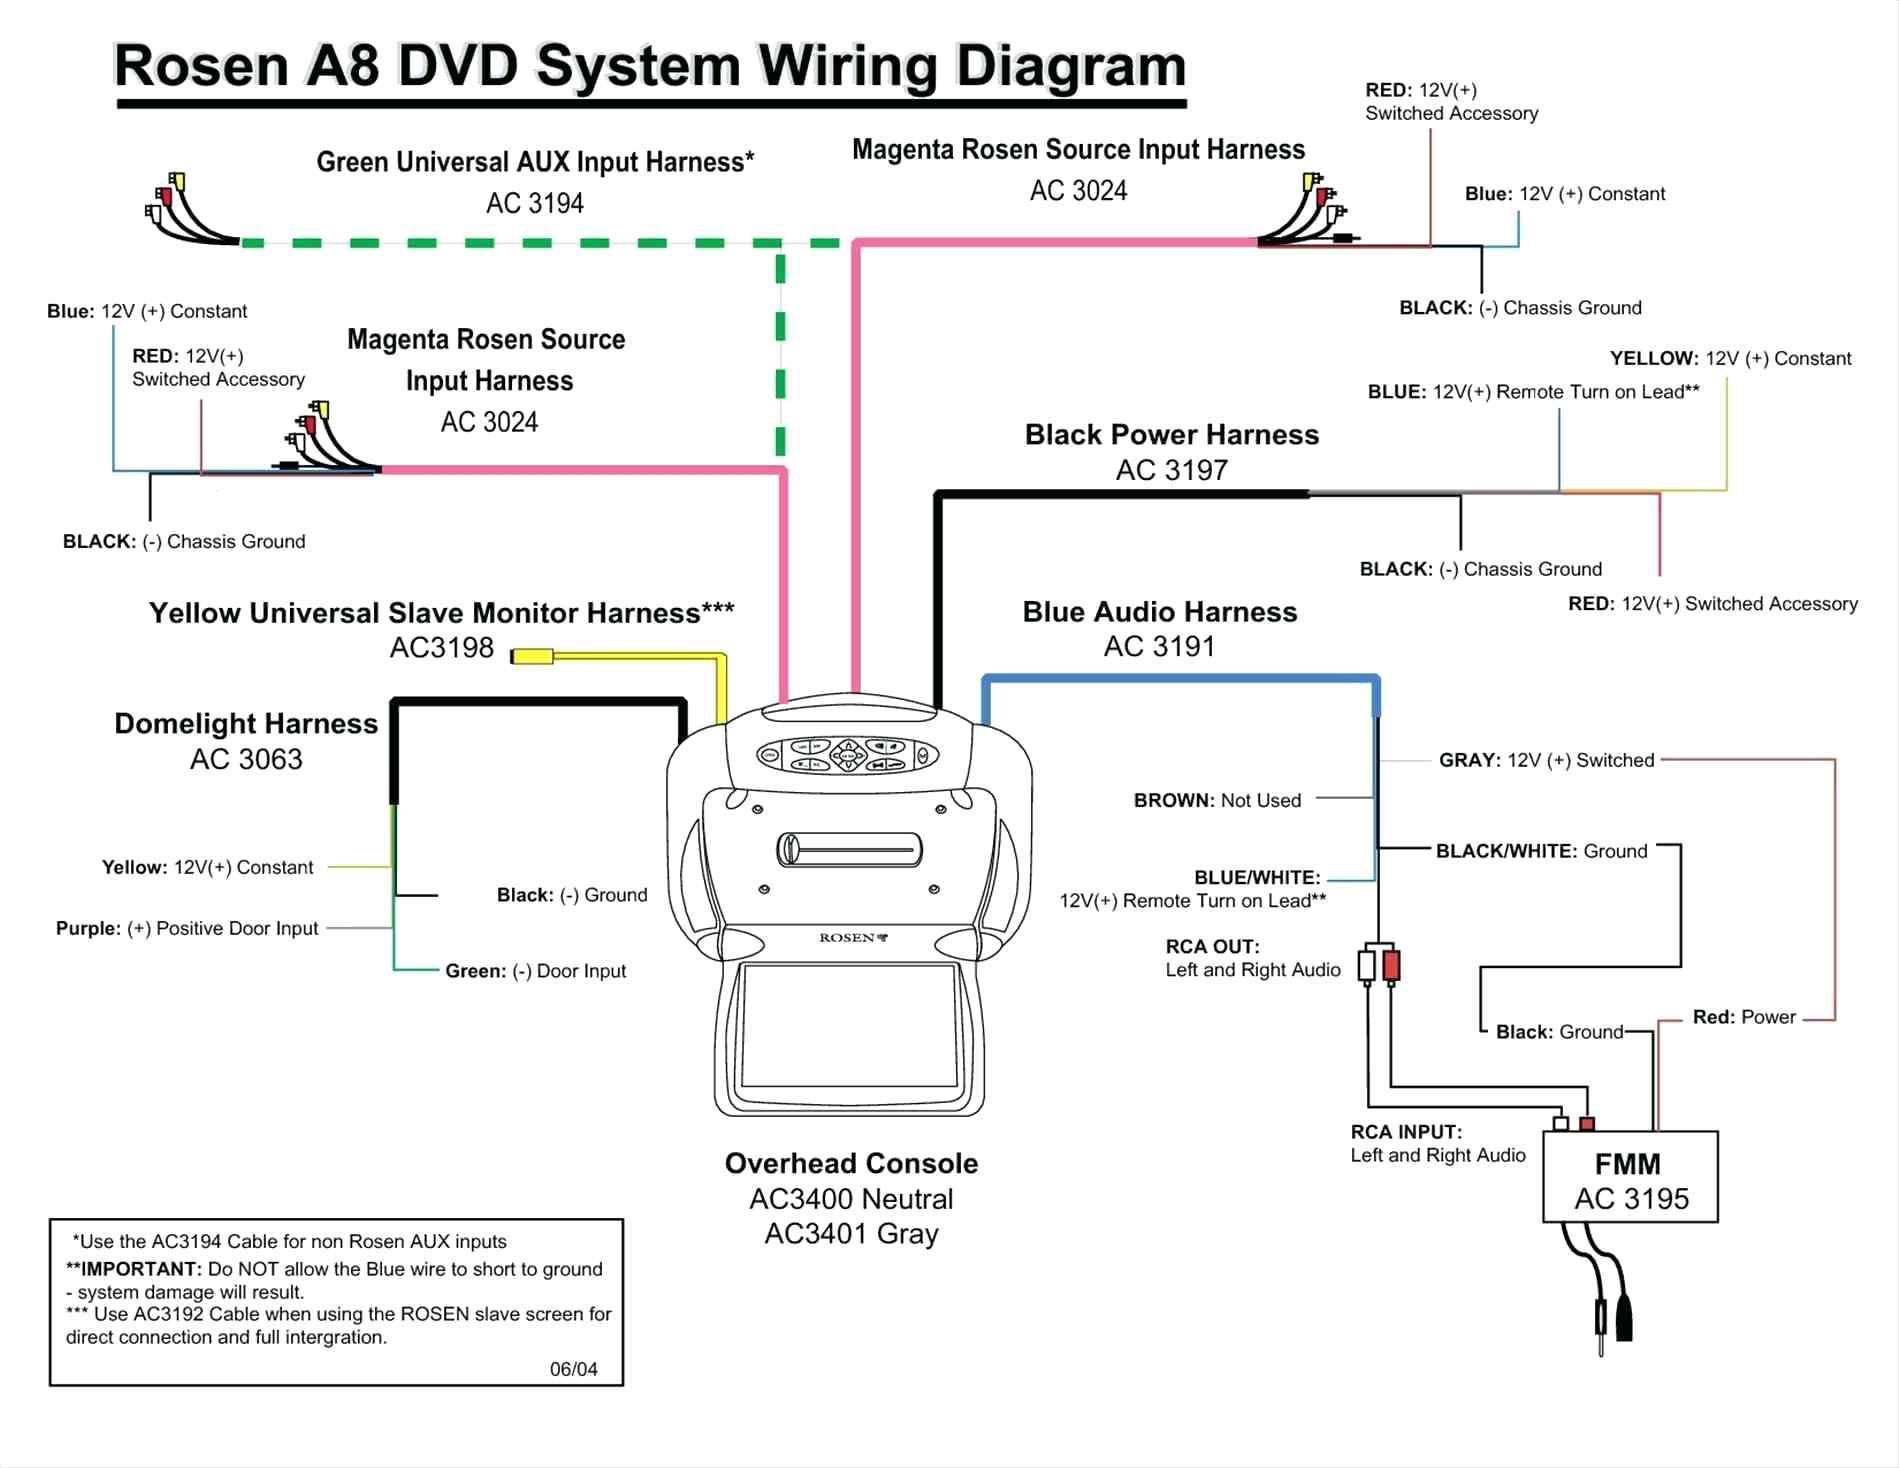 Square D 480 Volt Transformer Wiring Diagram | Wiring Diagram - Buck Boost Transformer Wiring Diagram